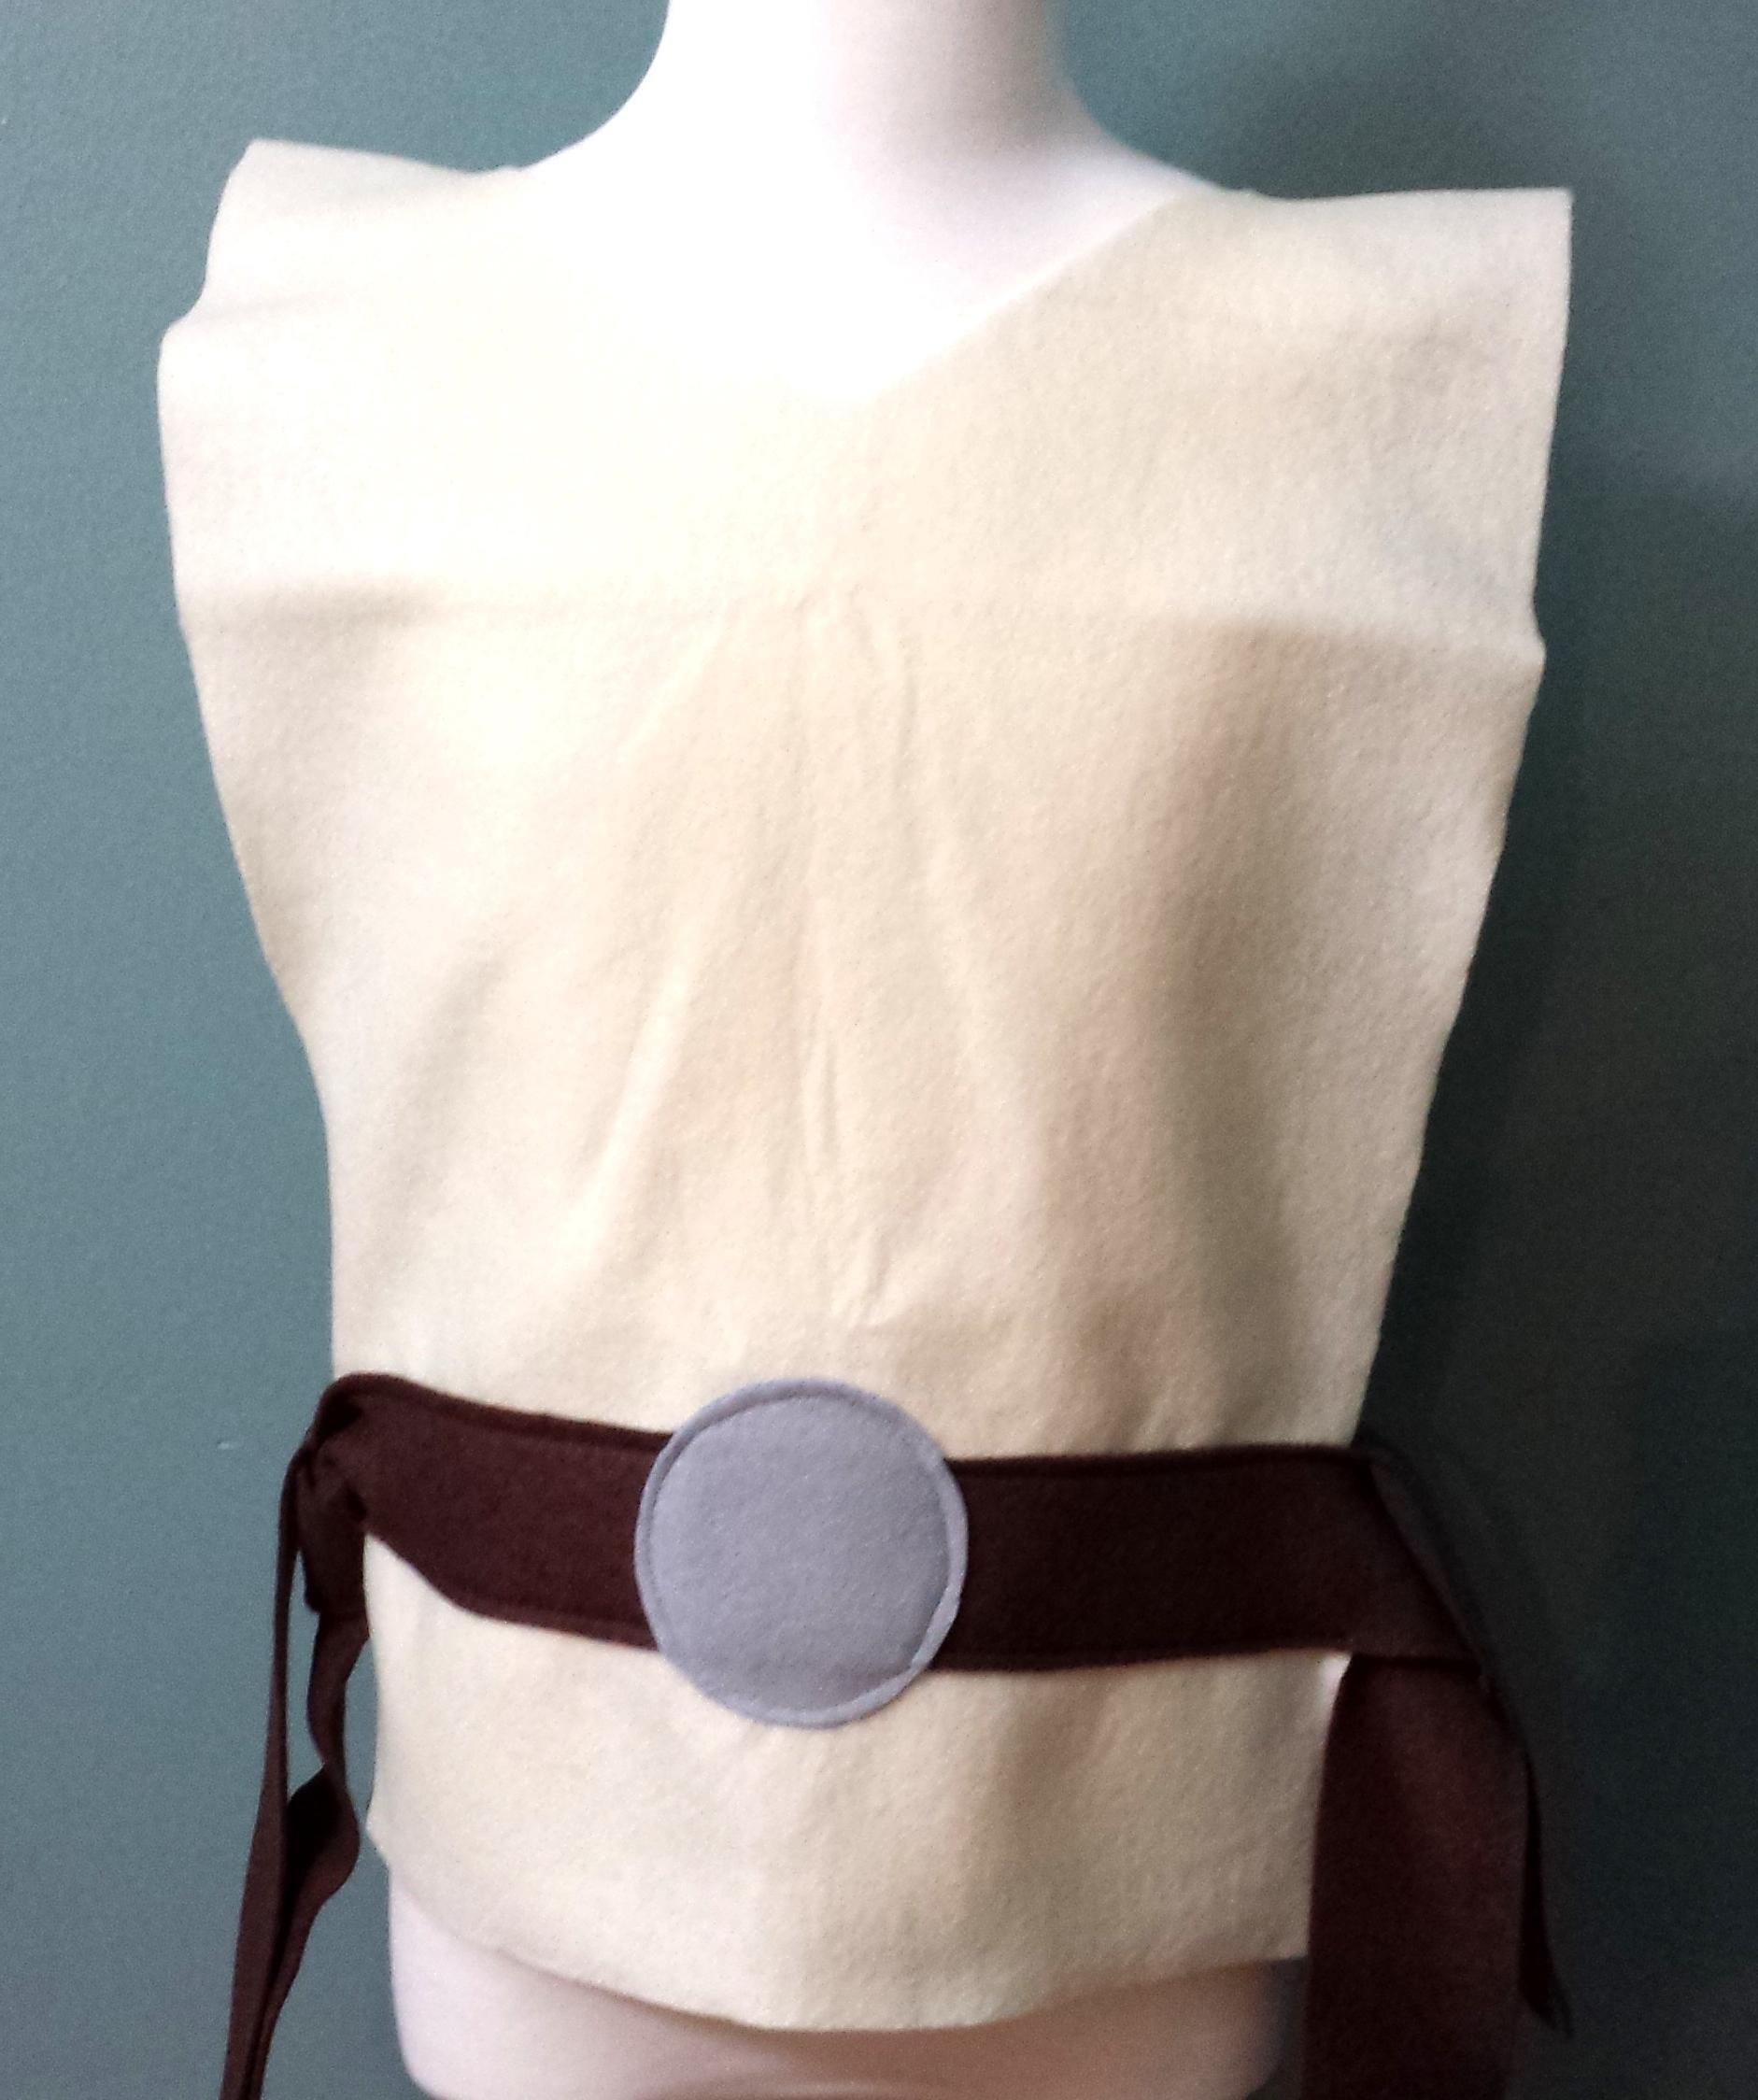 Adult Star Wars Jedi Costume Tunic - Perfect for under your Jedi Robe! (Luke Skywalker/Obi Wan Kenobi) - Baby/Toddler/Kids/Teen/Adult Sizes